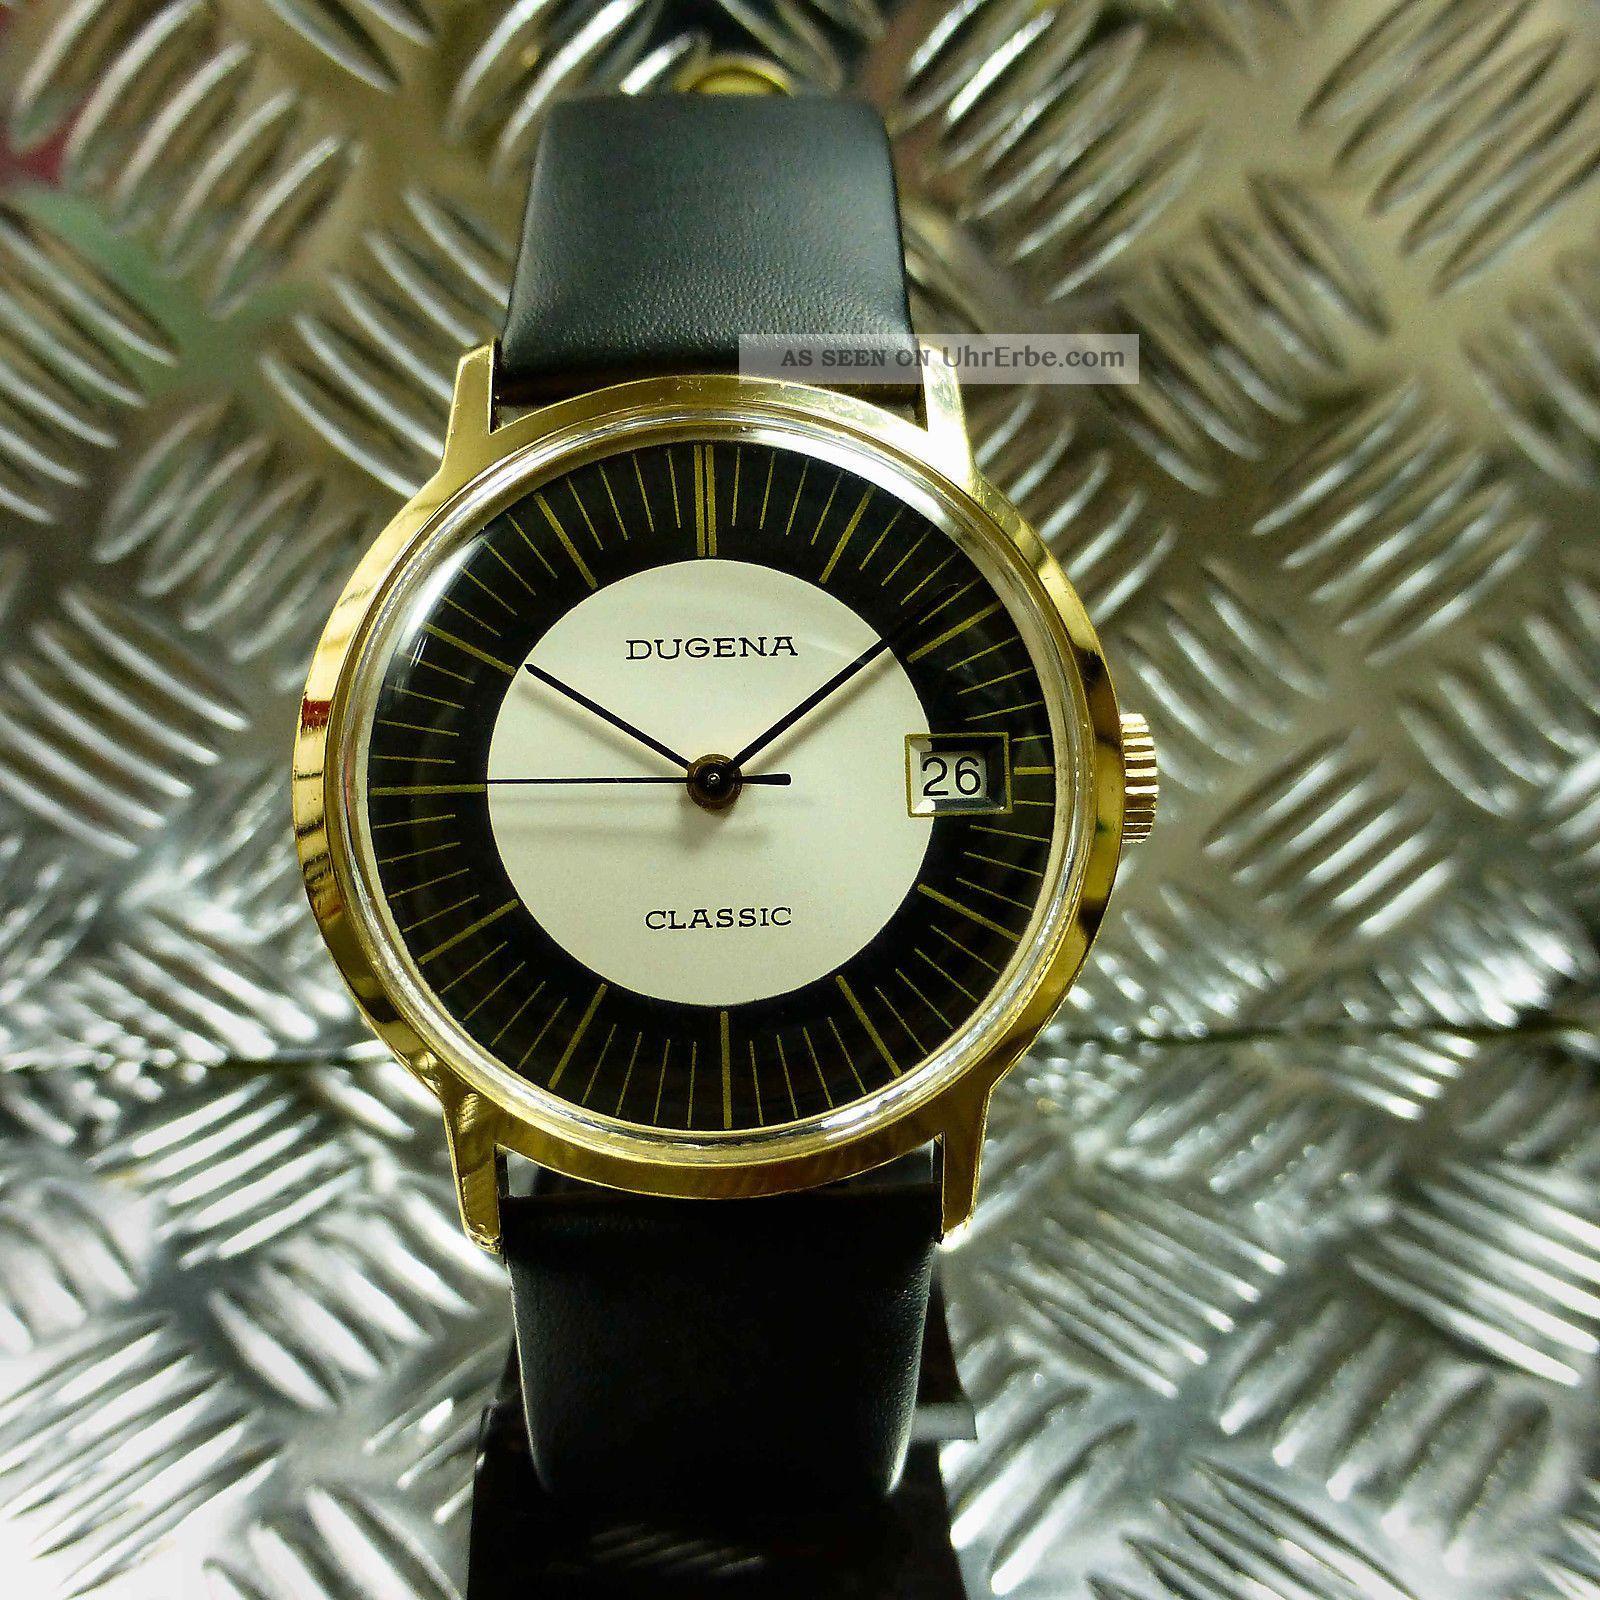 Vintage Top Echte 70èr Jahre Dugena Classic Handaufzug Herren Armbanduhr Armbanduhren Bild